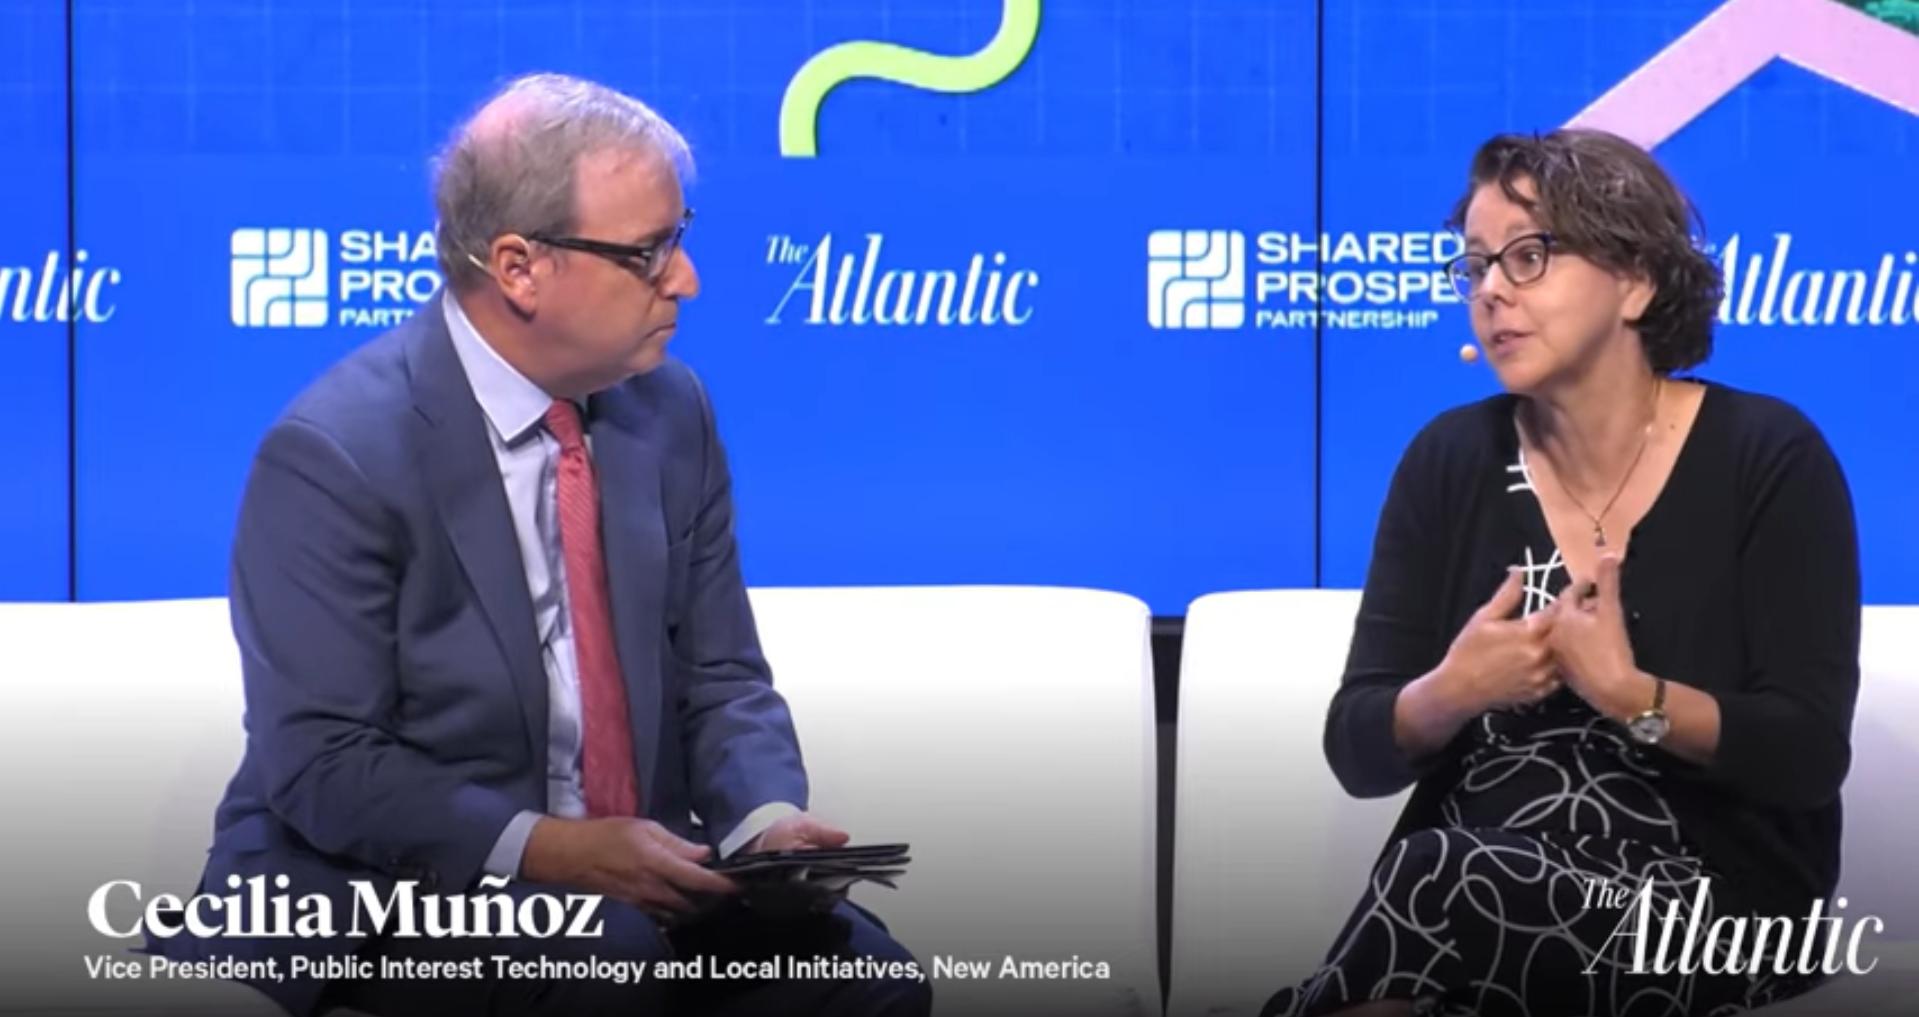 Cecilia Muñoz, Kresge board member with the Atlantic's Senior Editor Ron Brownstein